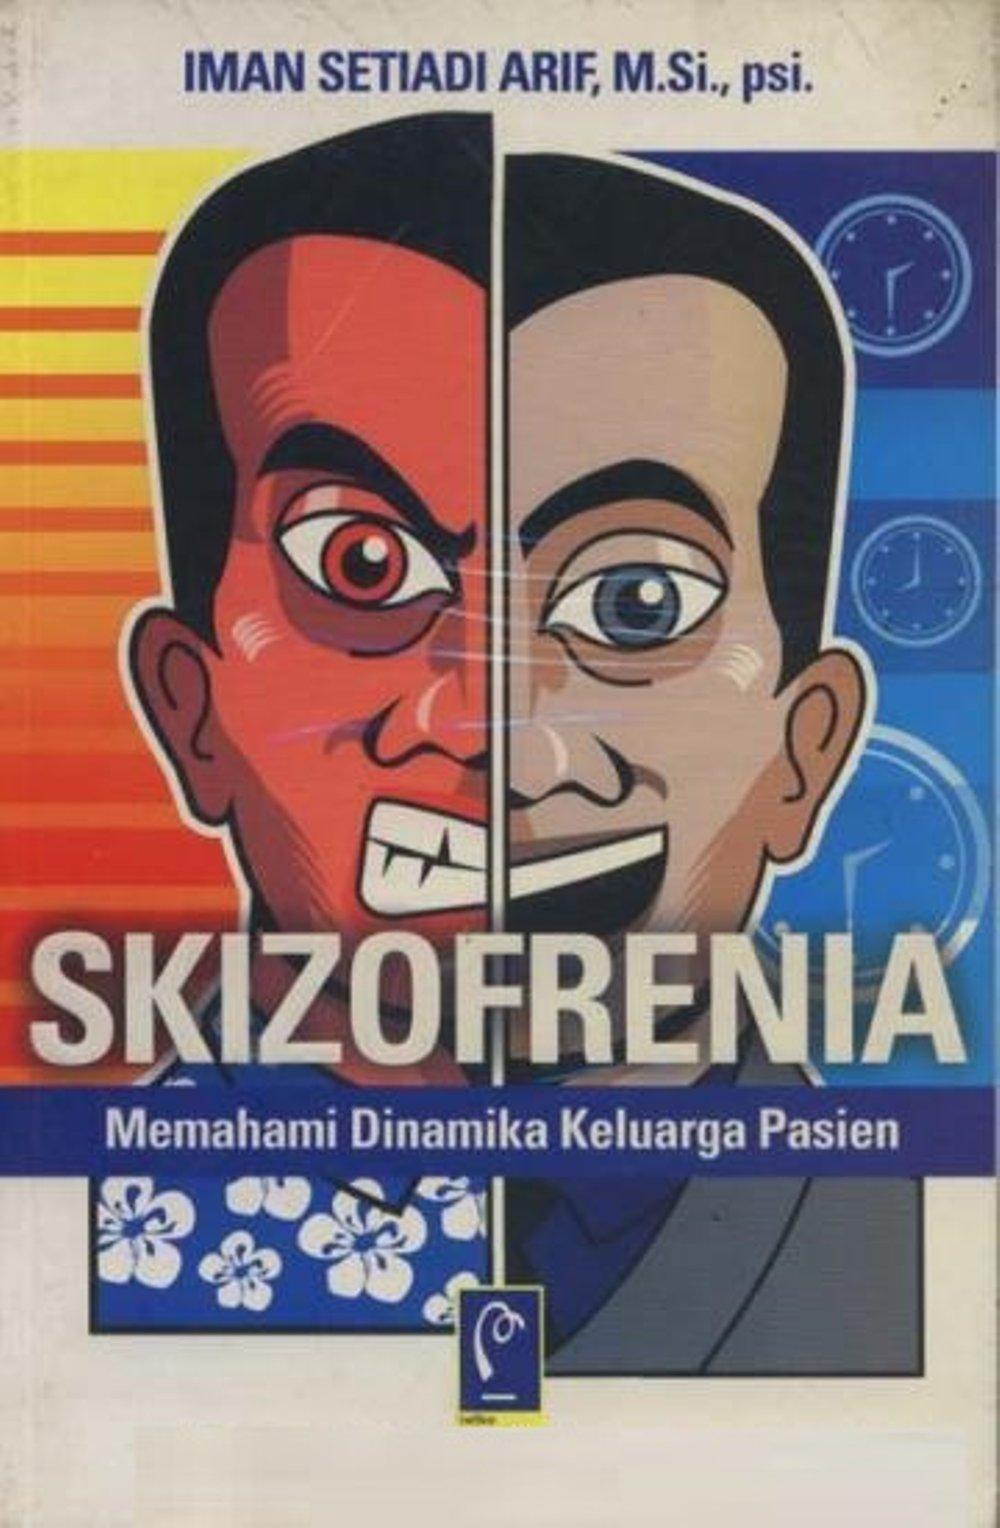 Buku Skizofrenia: Memahami Dinamika Keluarga Pasien - Iman Setiadi Arif